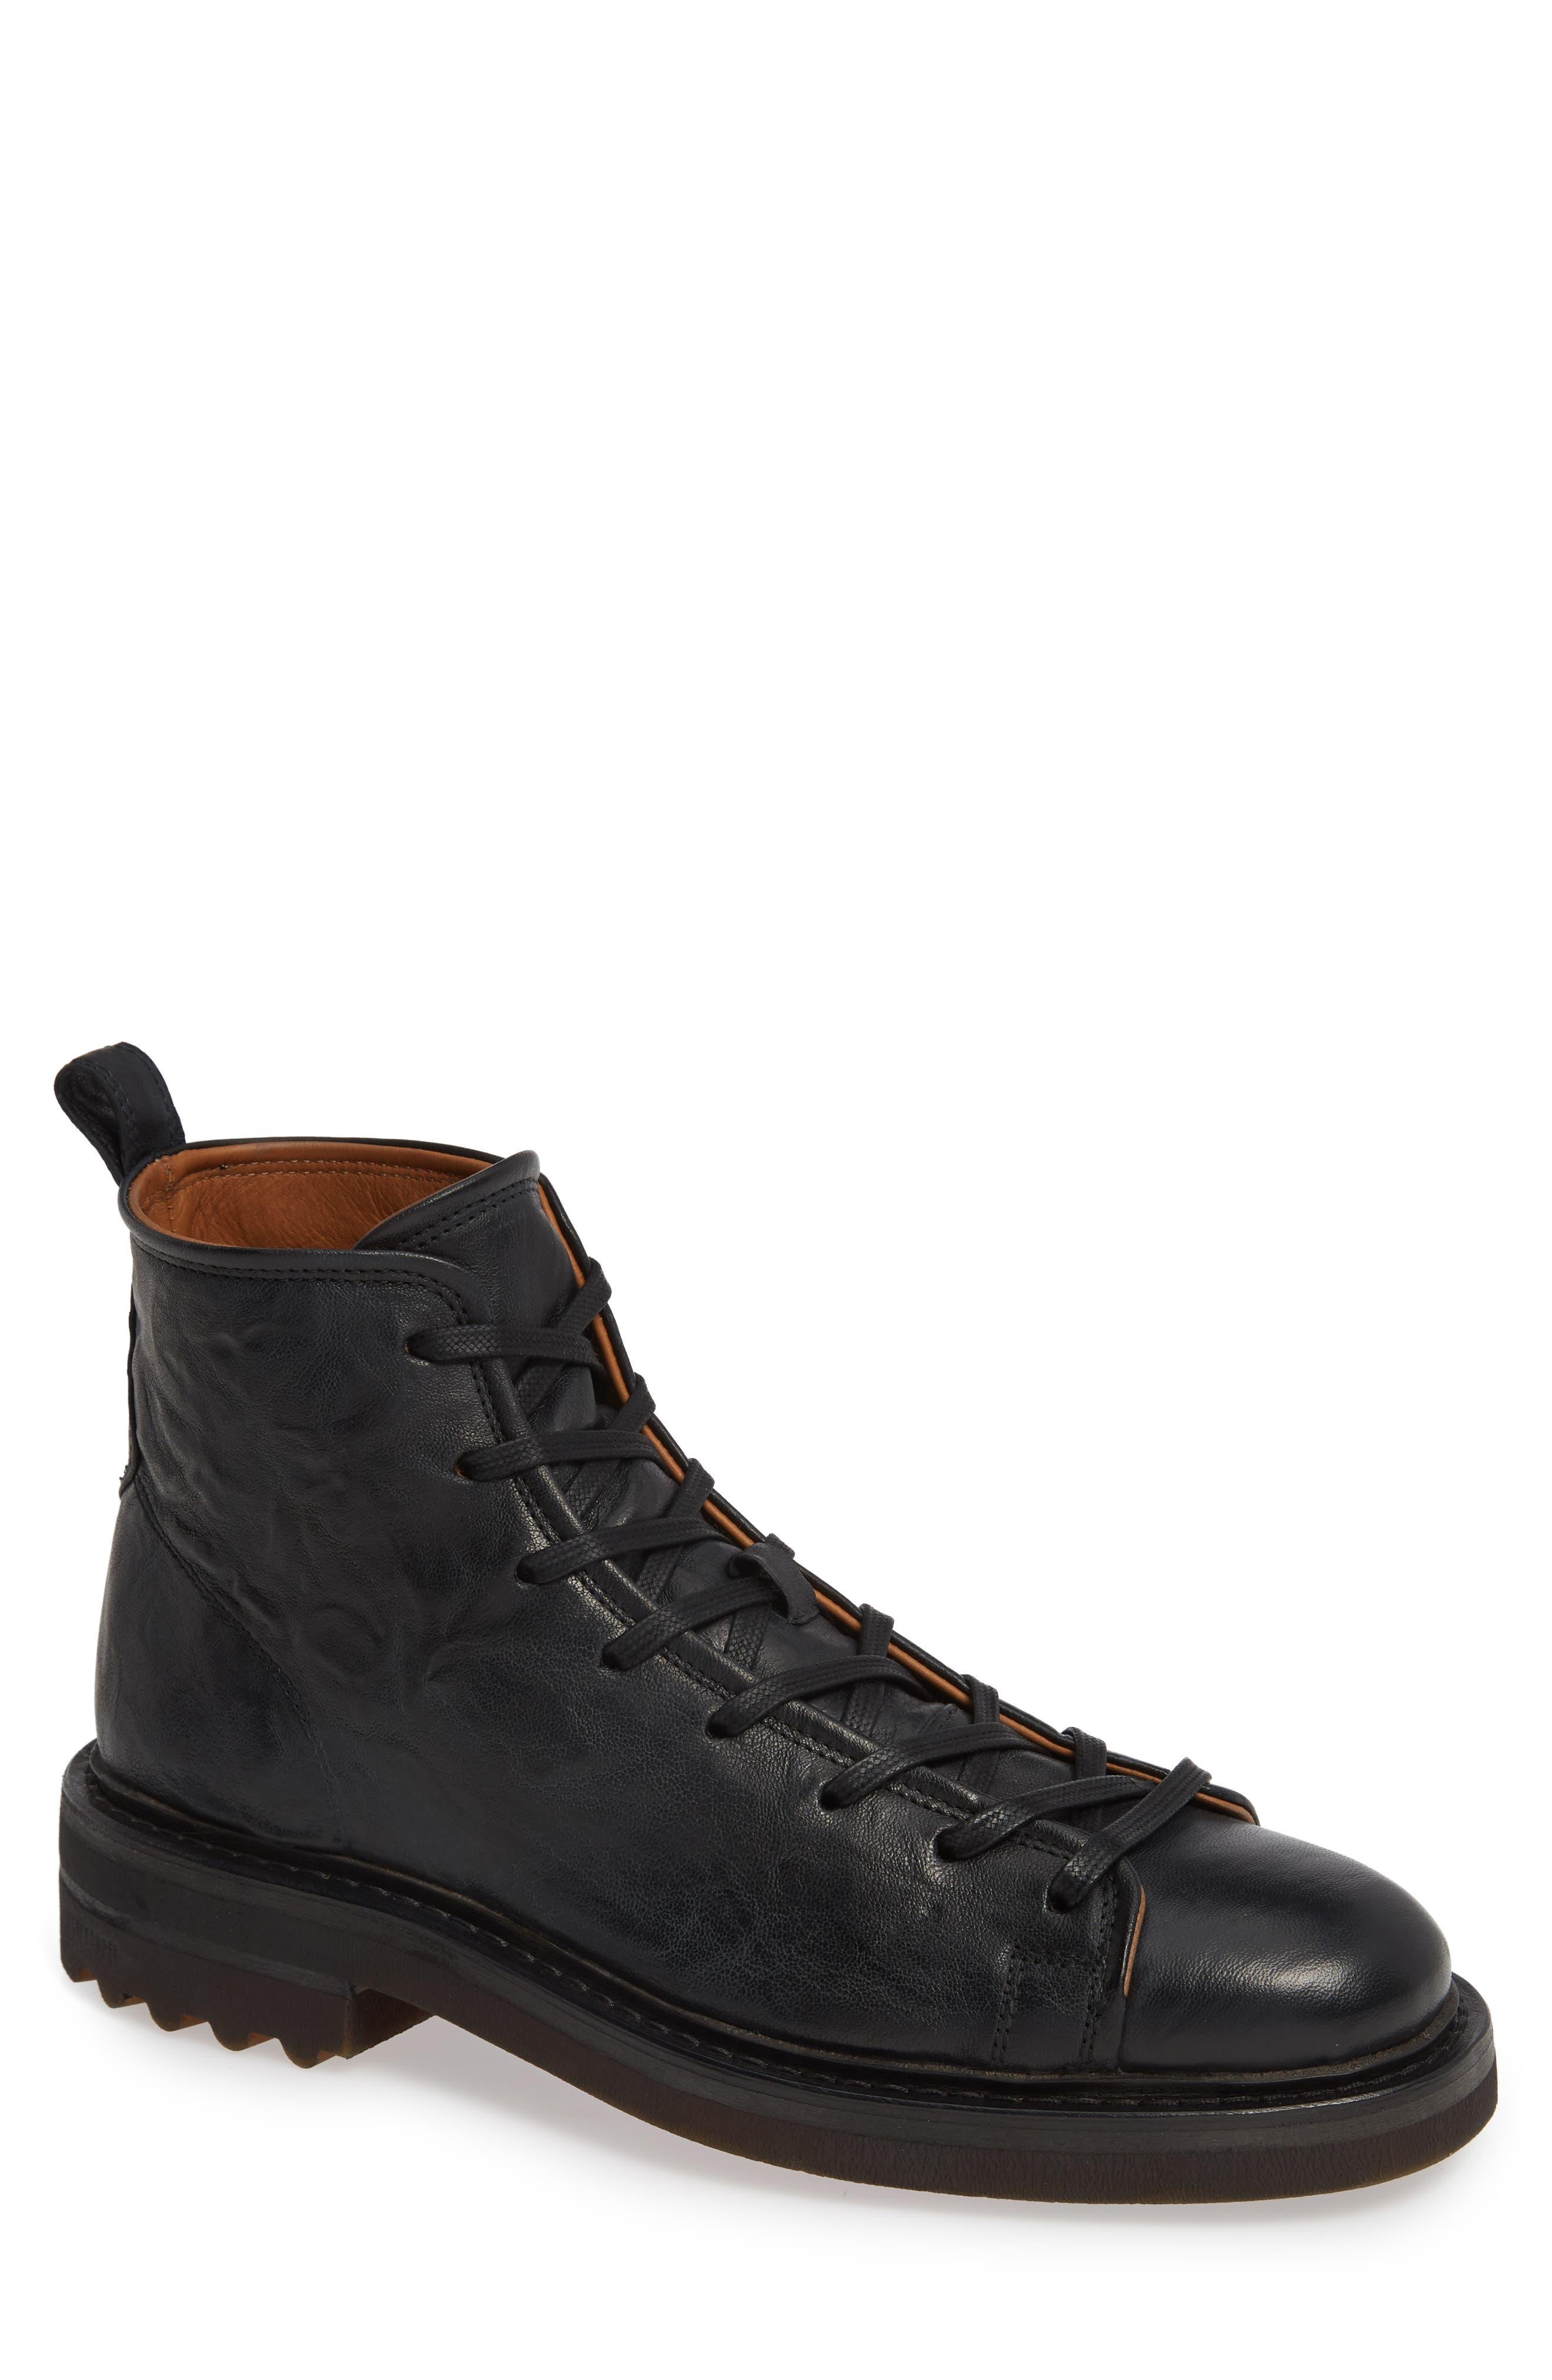 John Varvatos Collection Essex Plain Toe Boot, Black